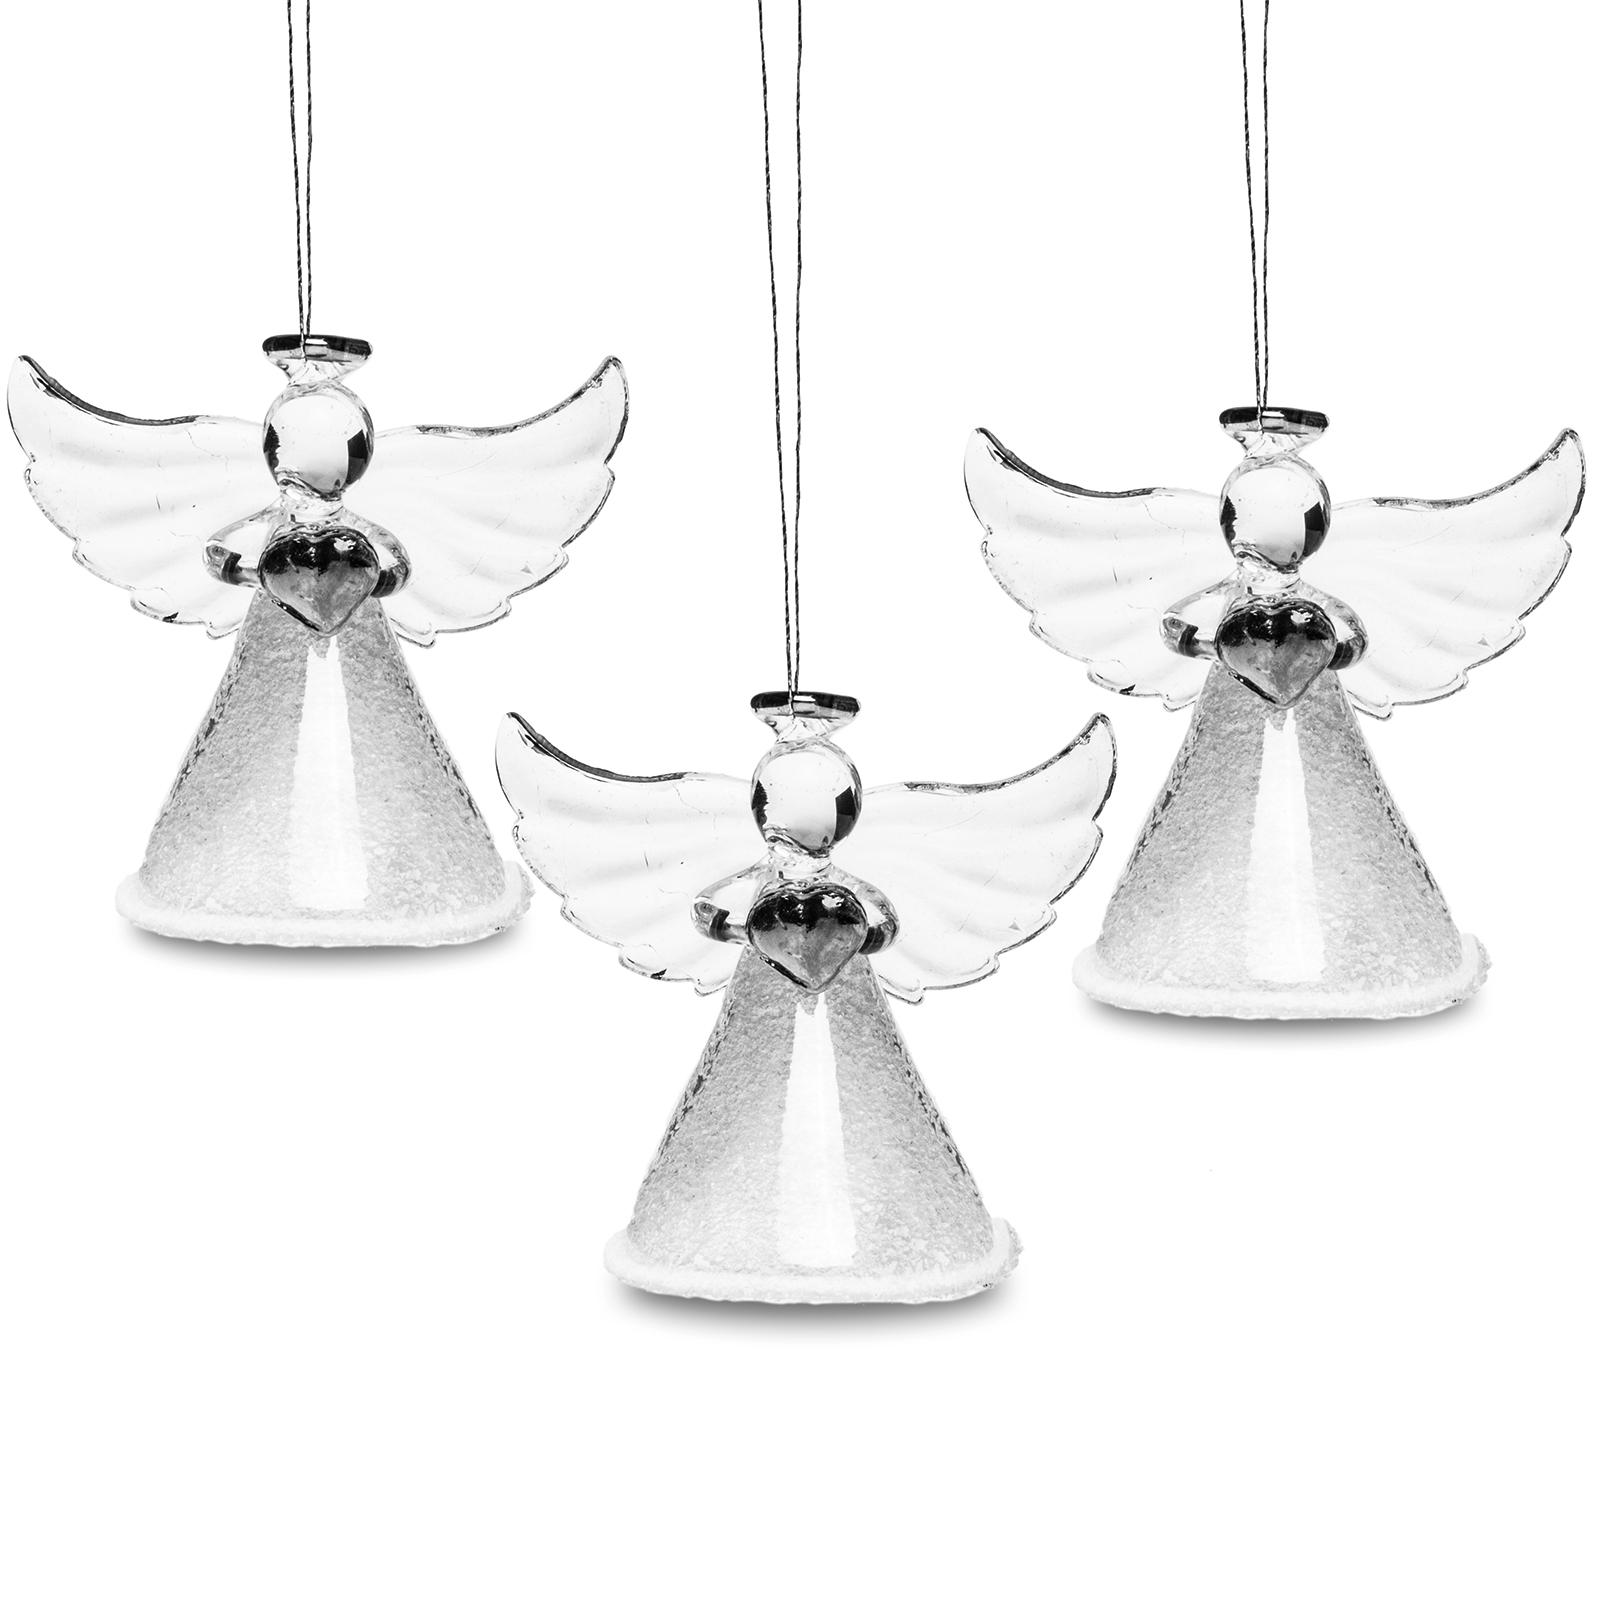 sikora christbaumschmuck weihnachtsbaum anh nger glas engel mit herz 3er set ebay. Black Bedroom Furniture Sets. Home Design Ideas